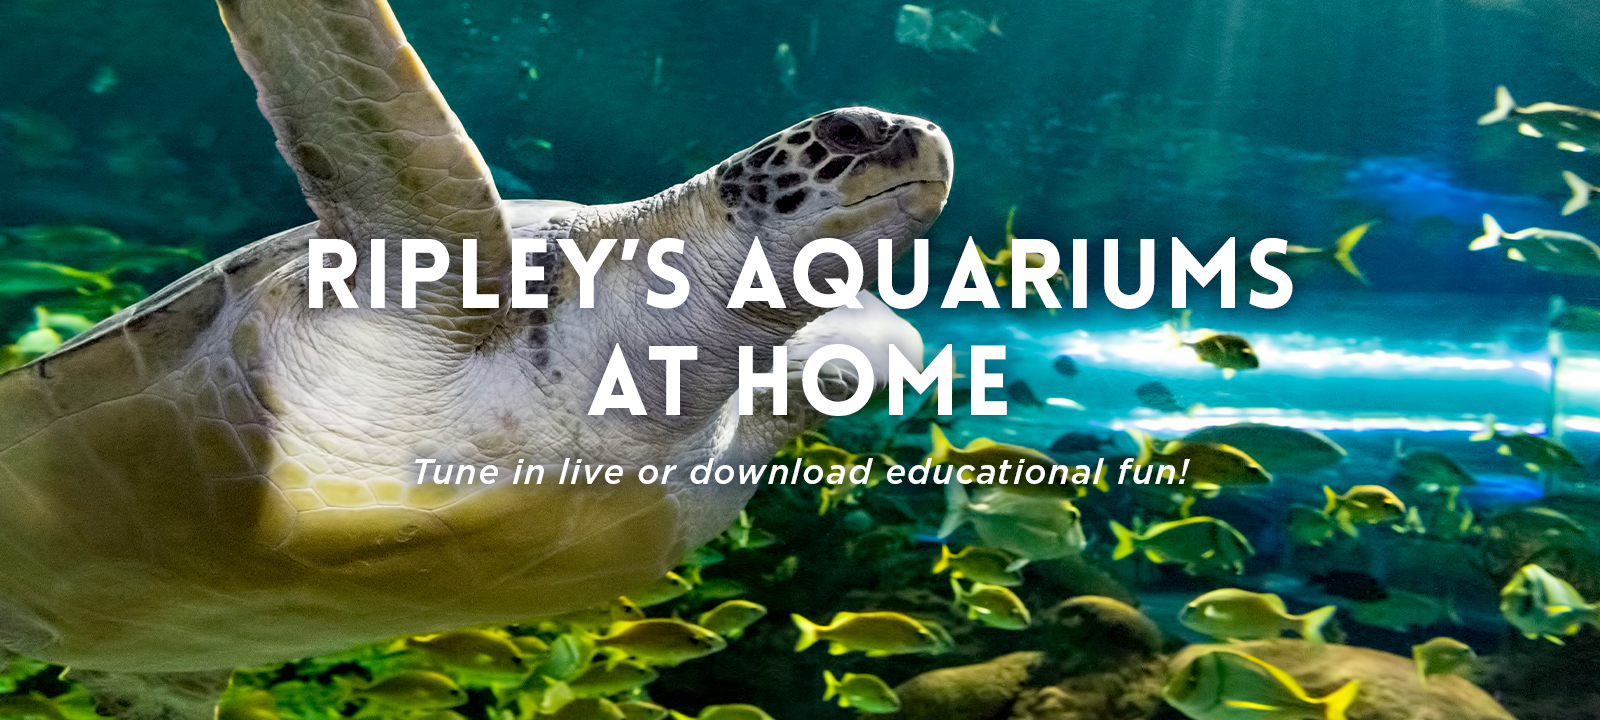 Ripley's Aquariums At Home Activities Banner